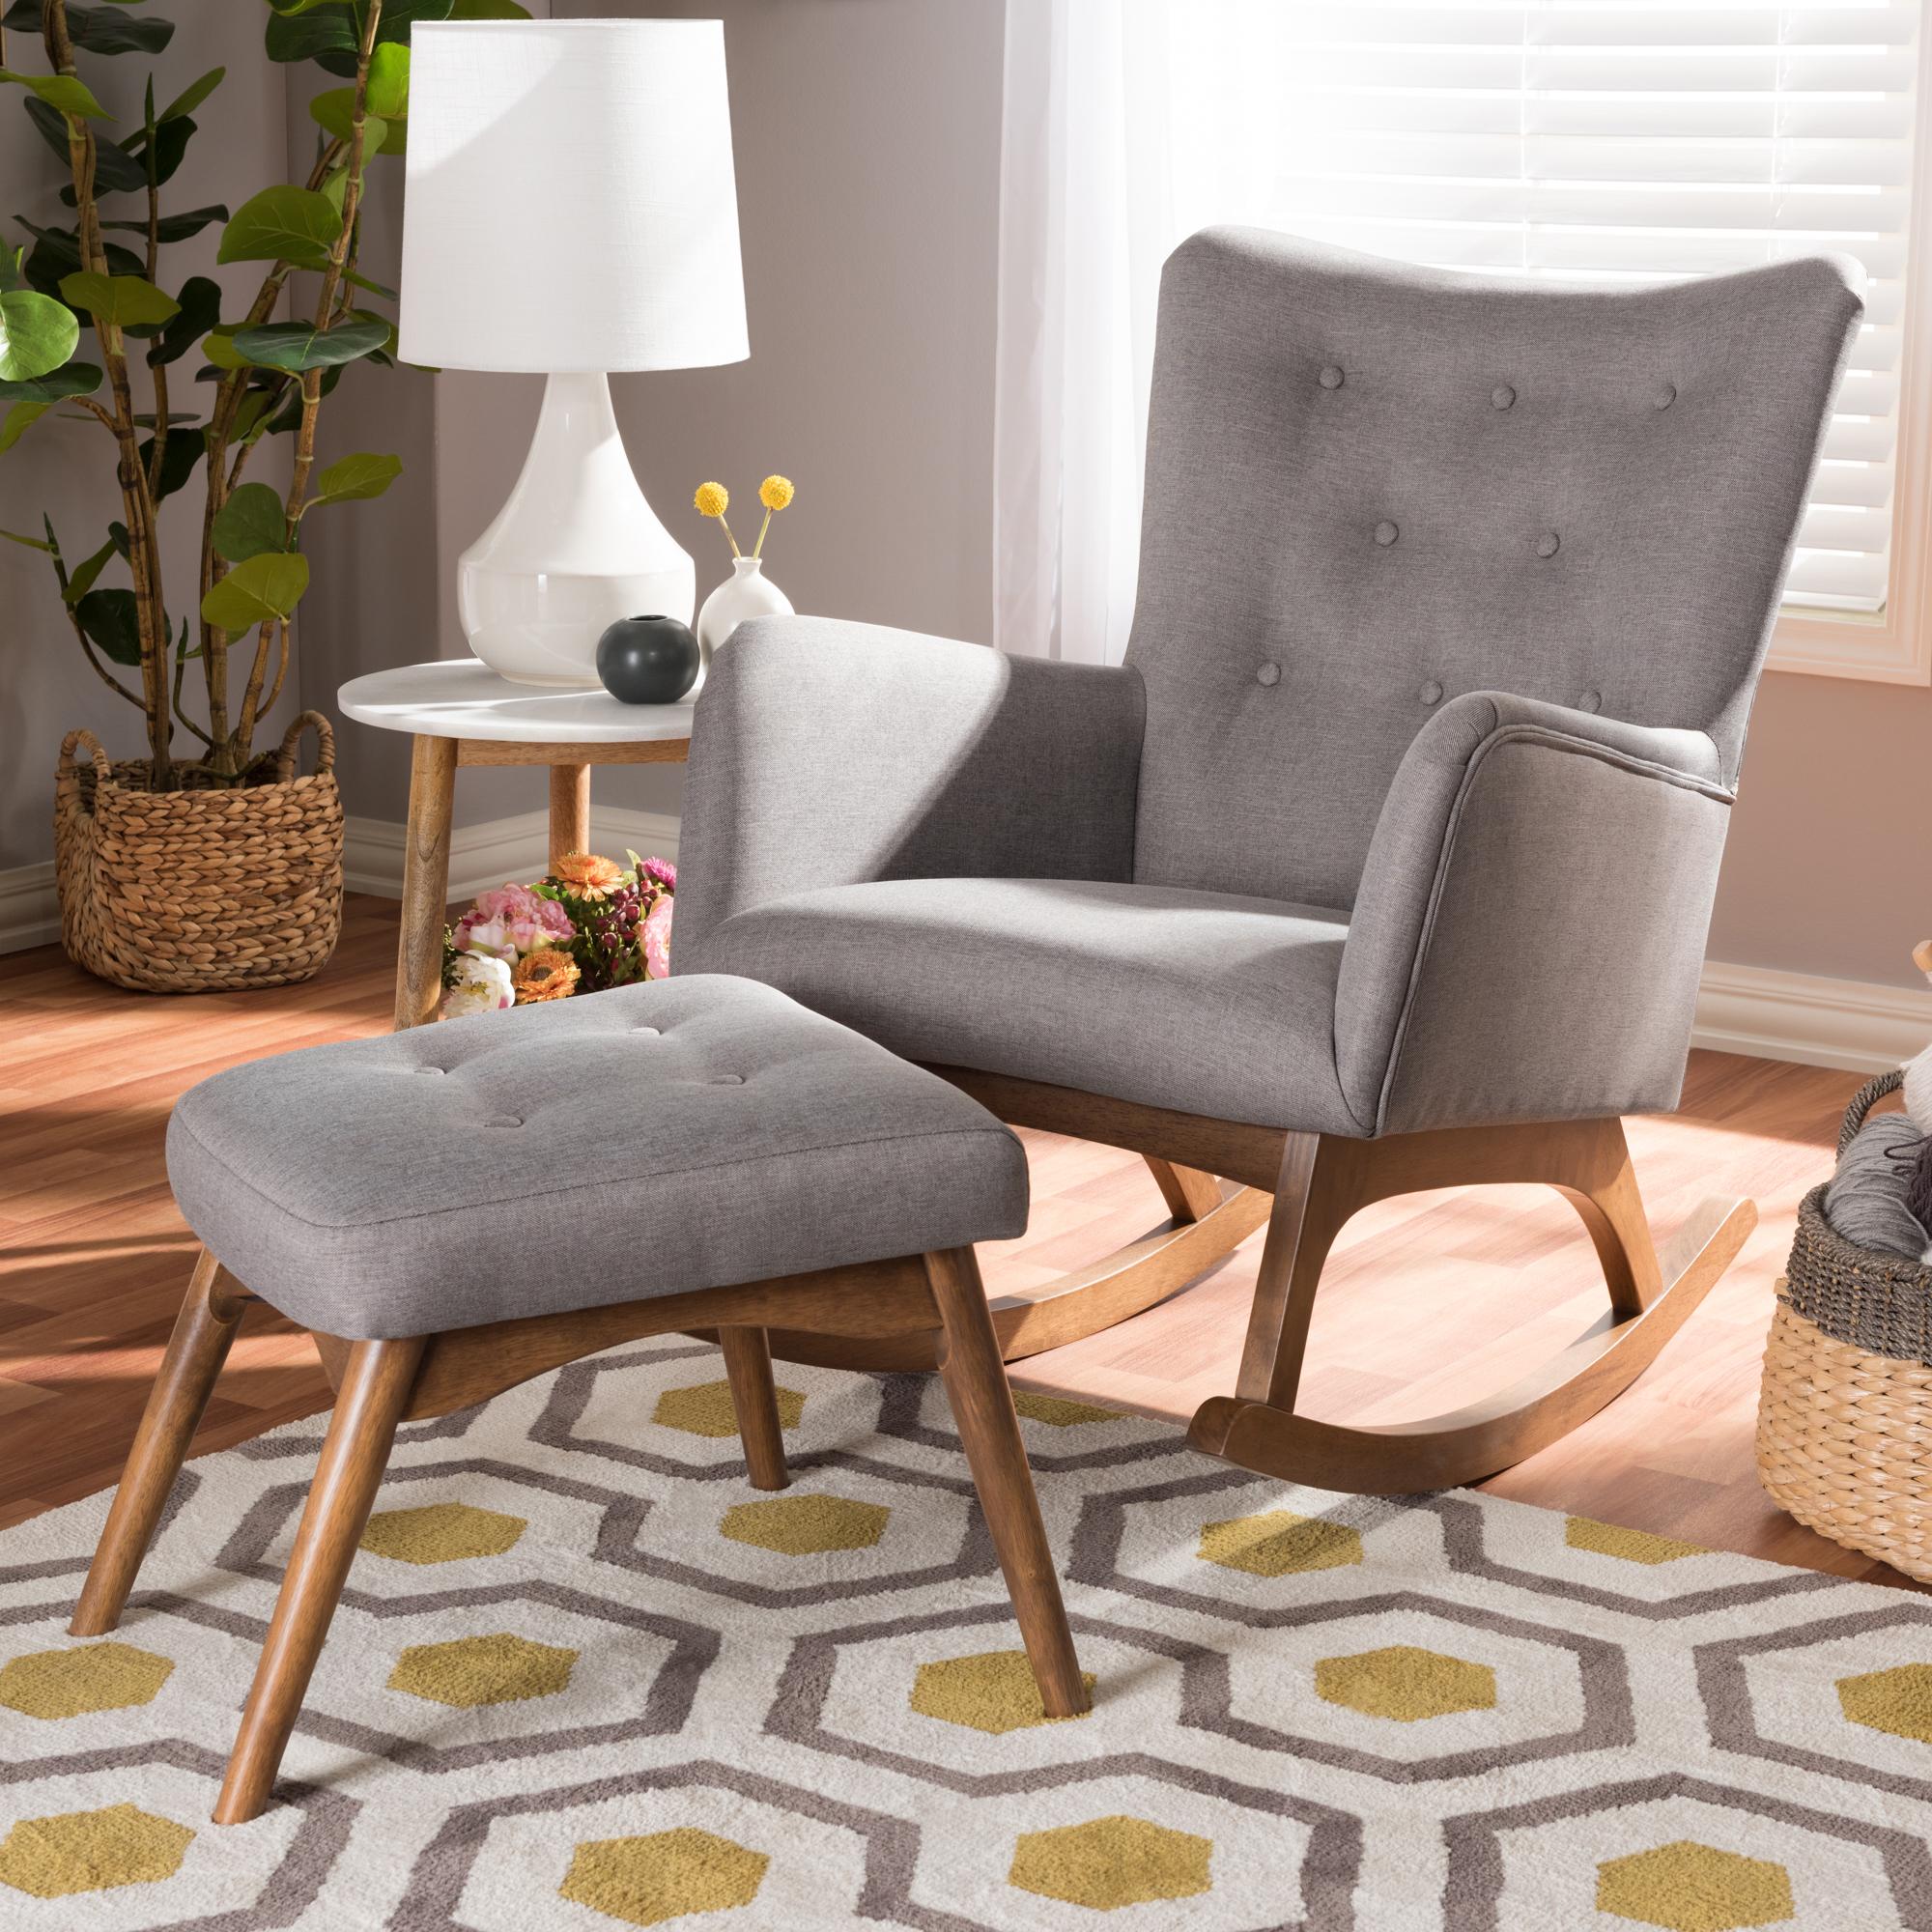 ... Baxton Studio Waldmann Mid Century Modern Grey Fabric Upholstered  Rocking Chair And Ottoman Set ...